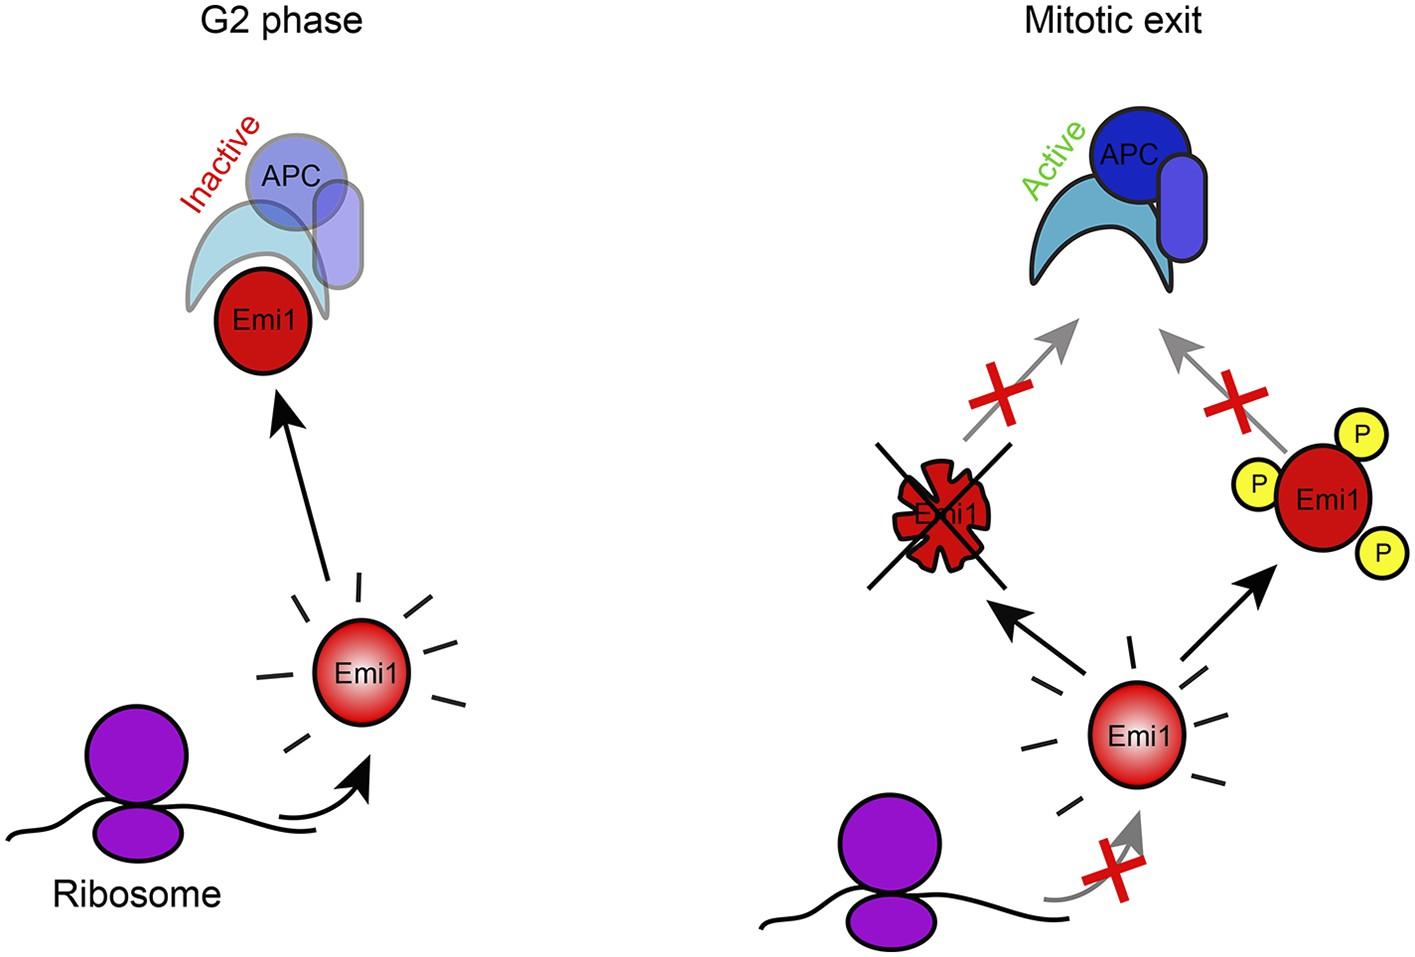 Regulation of mRNA translation during mitosis | eLife